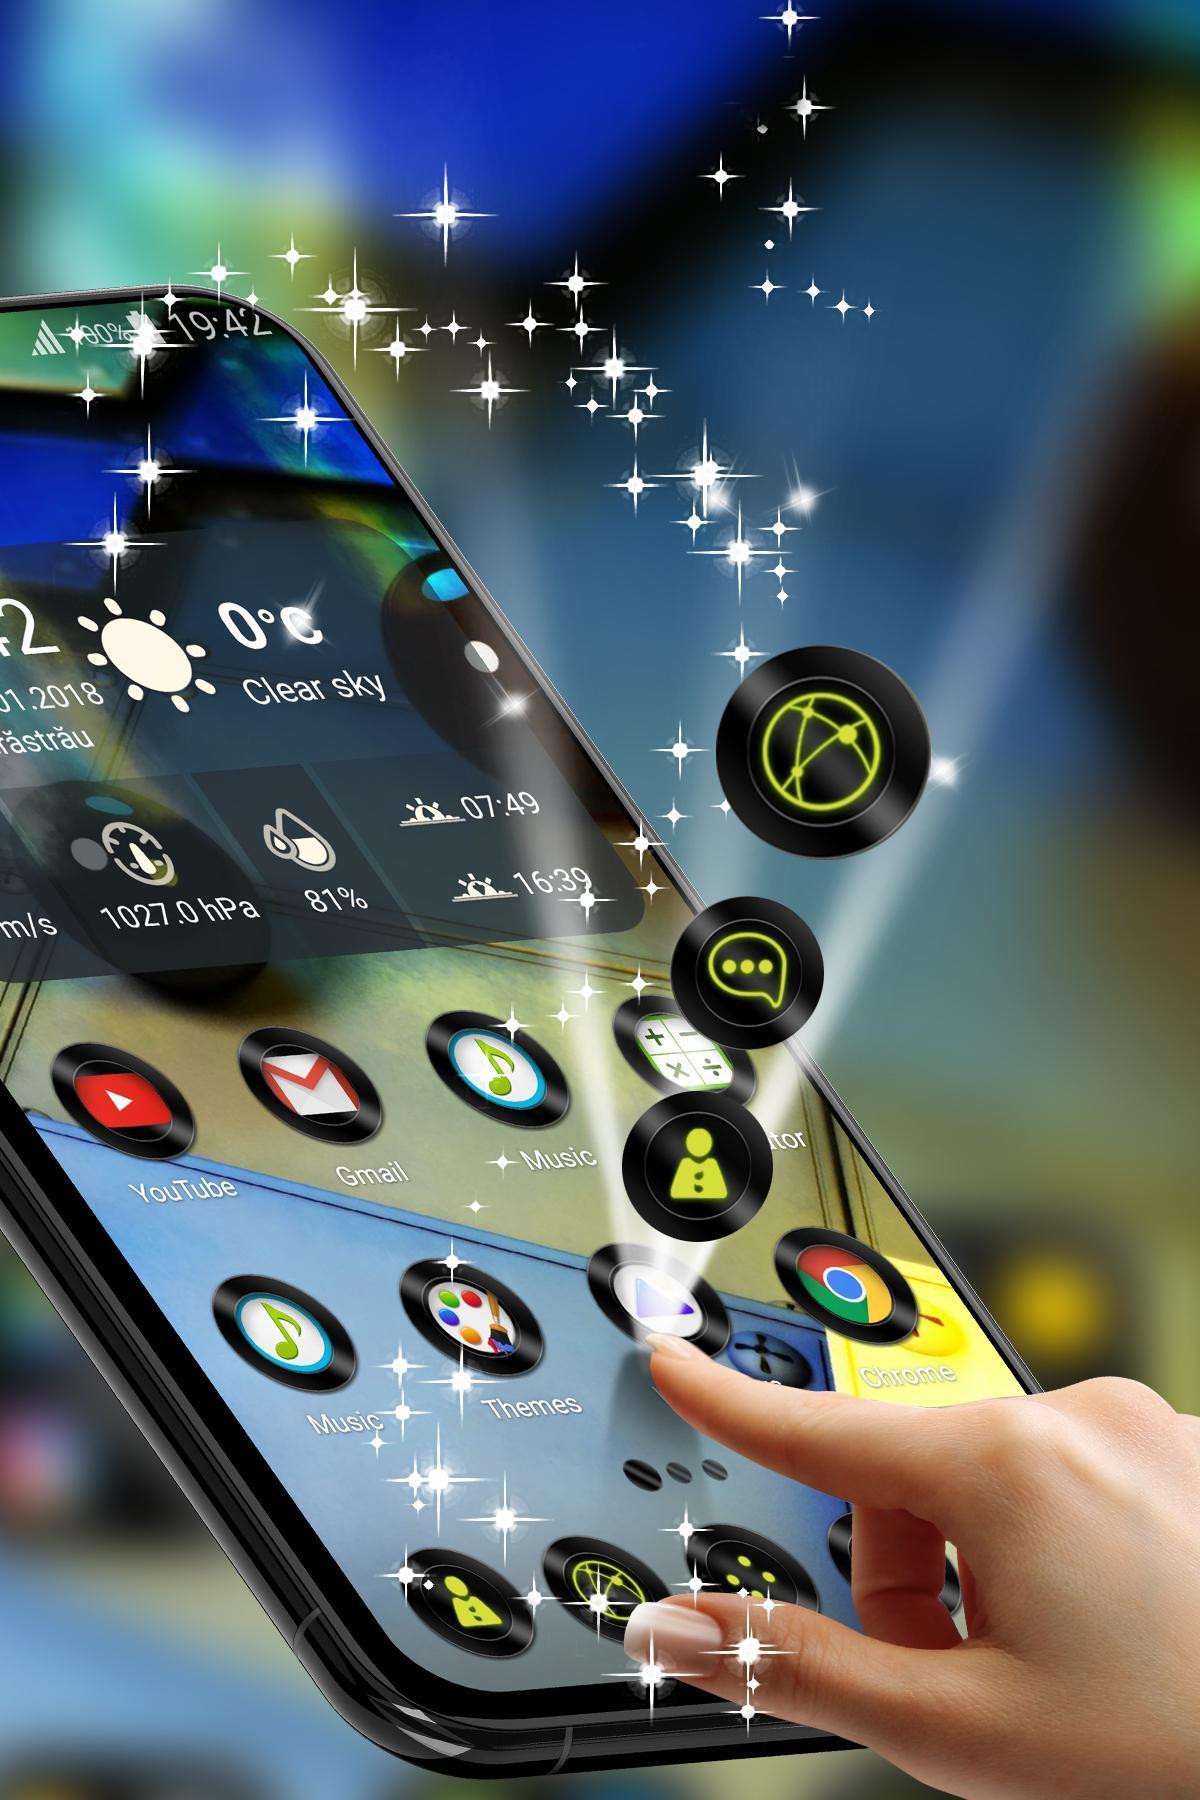 Samsung Themes Apk 2019